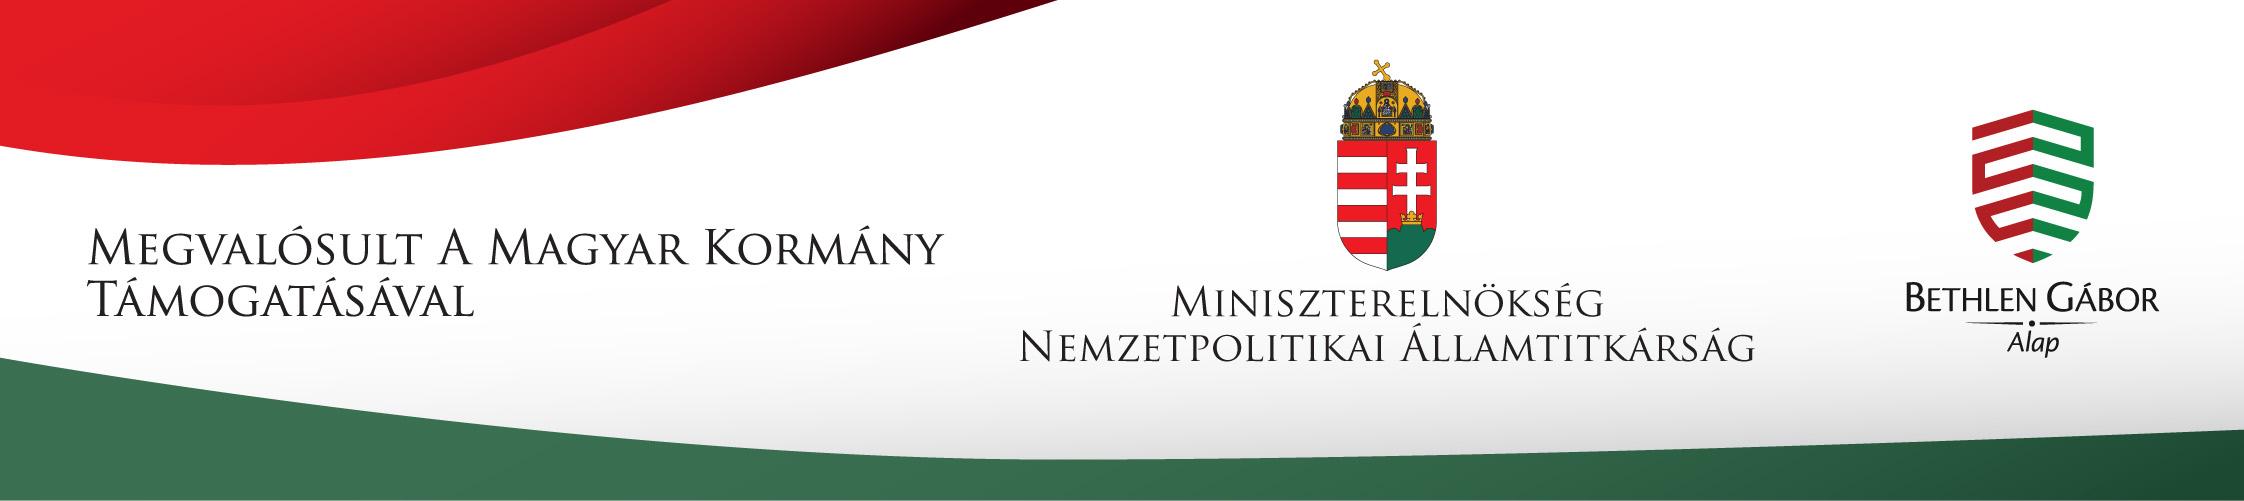 https://bgazrt.hu/wp-content/uploads/2019/05/megvalosult_a_magyar_kormany_tamogatasaval_bga_alap.jpg